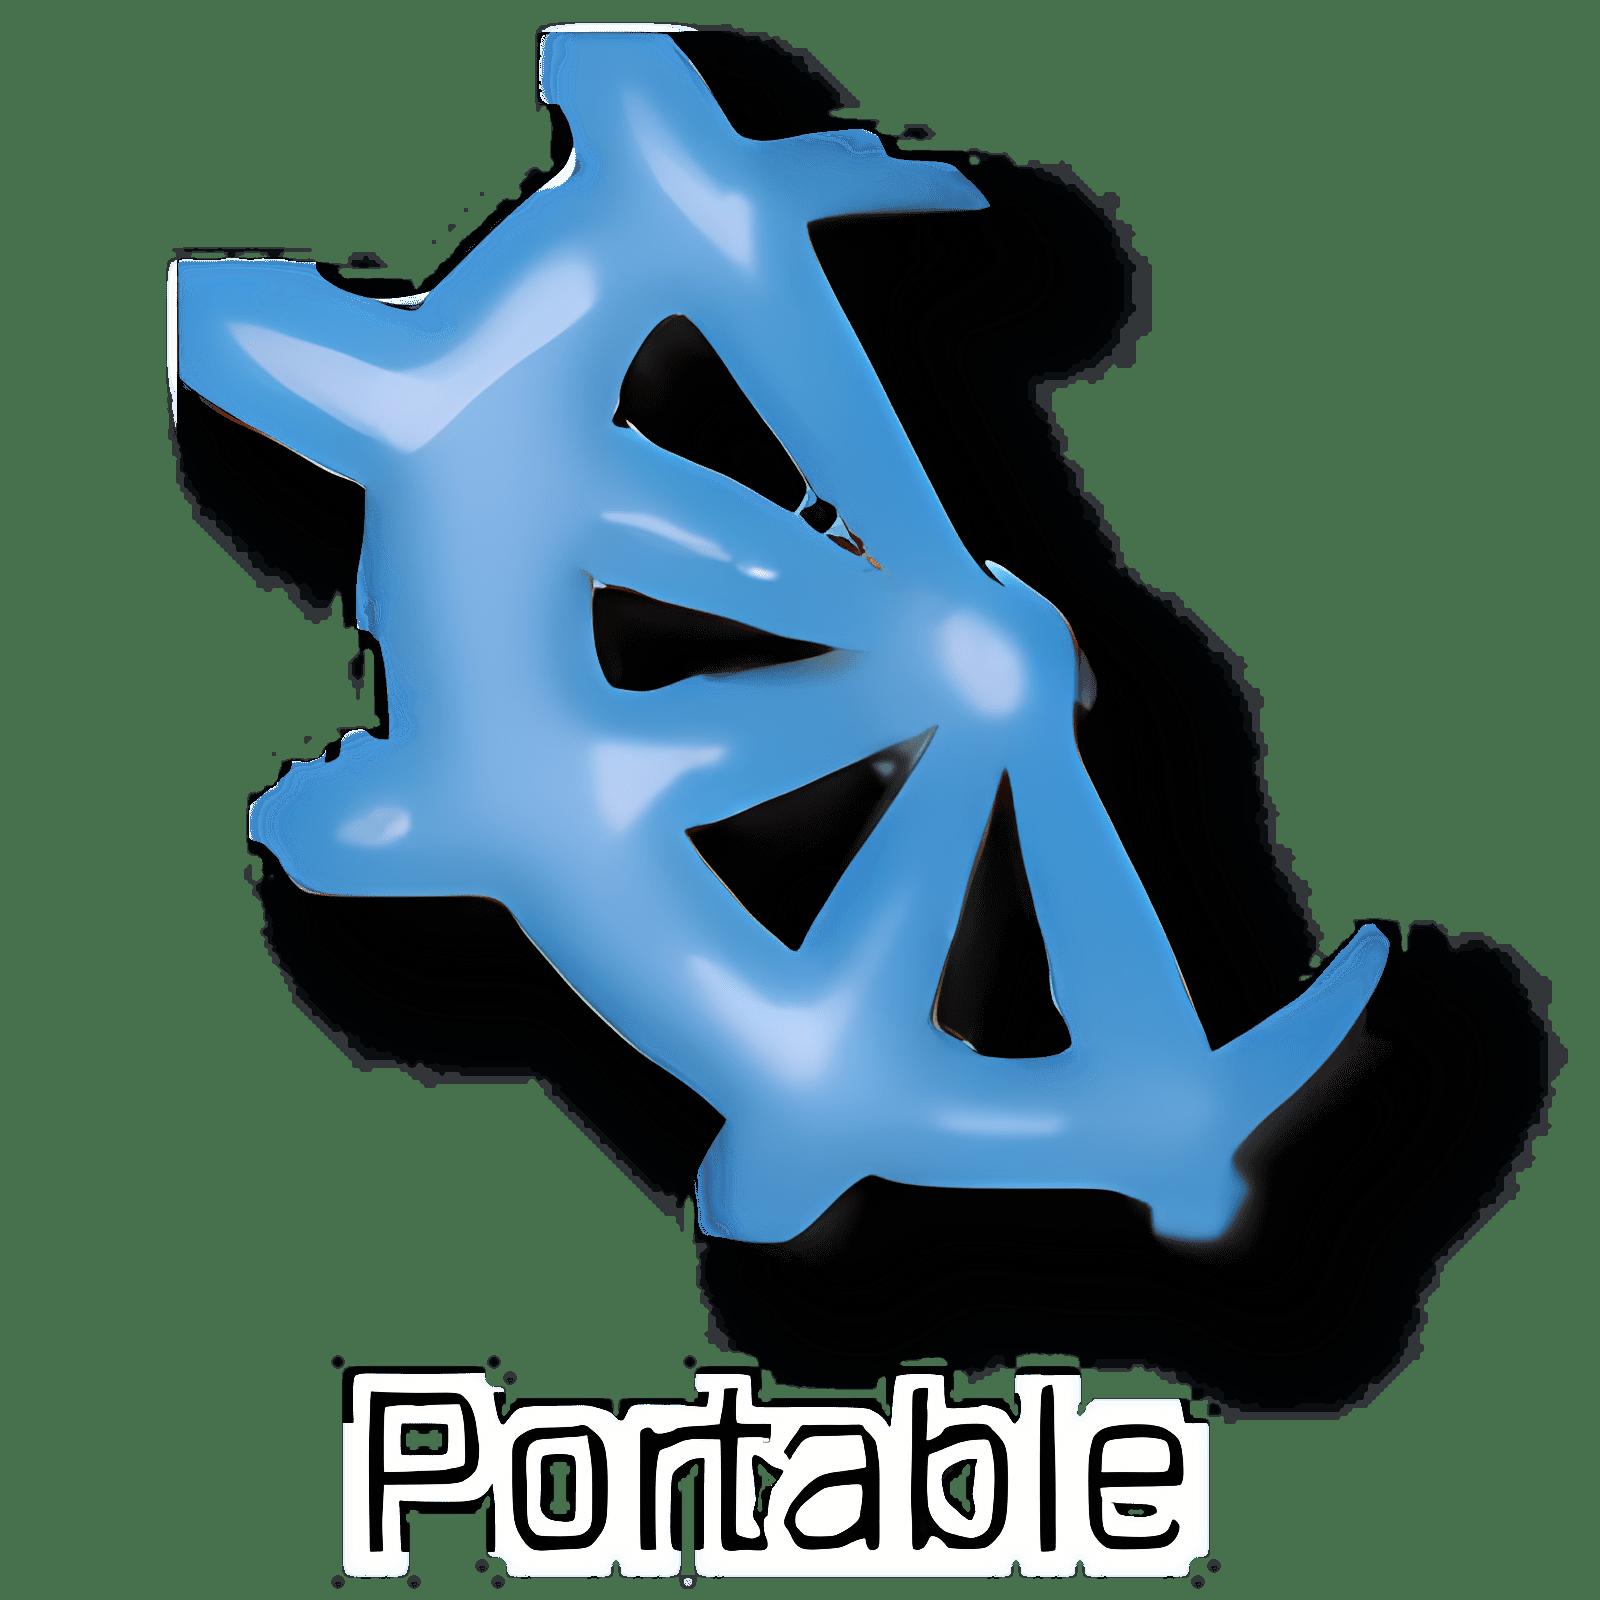 JPEG Lossless Rotator Portable